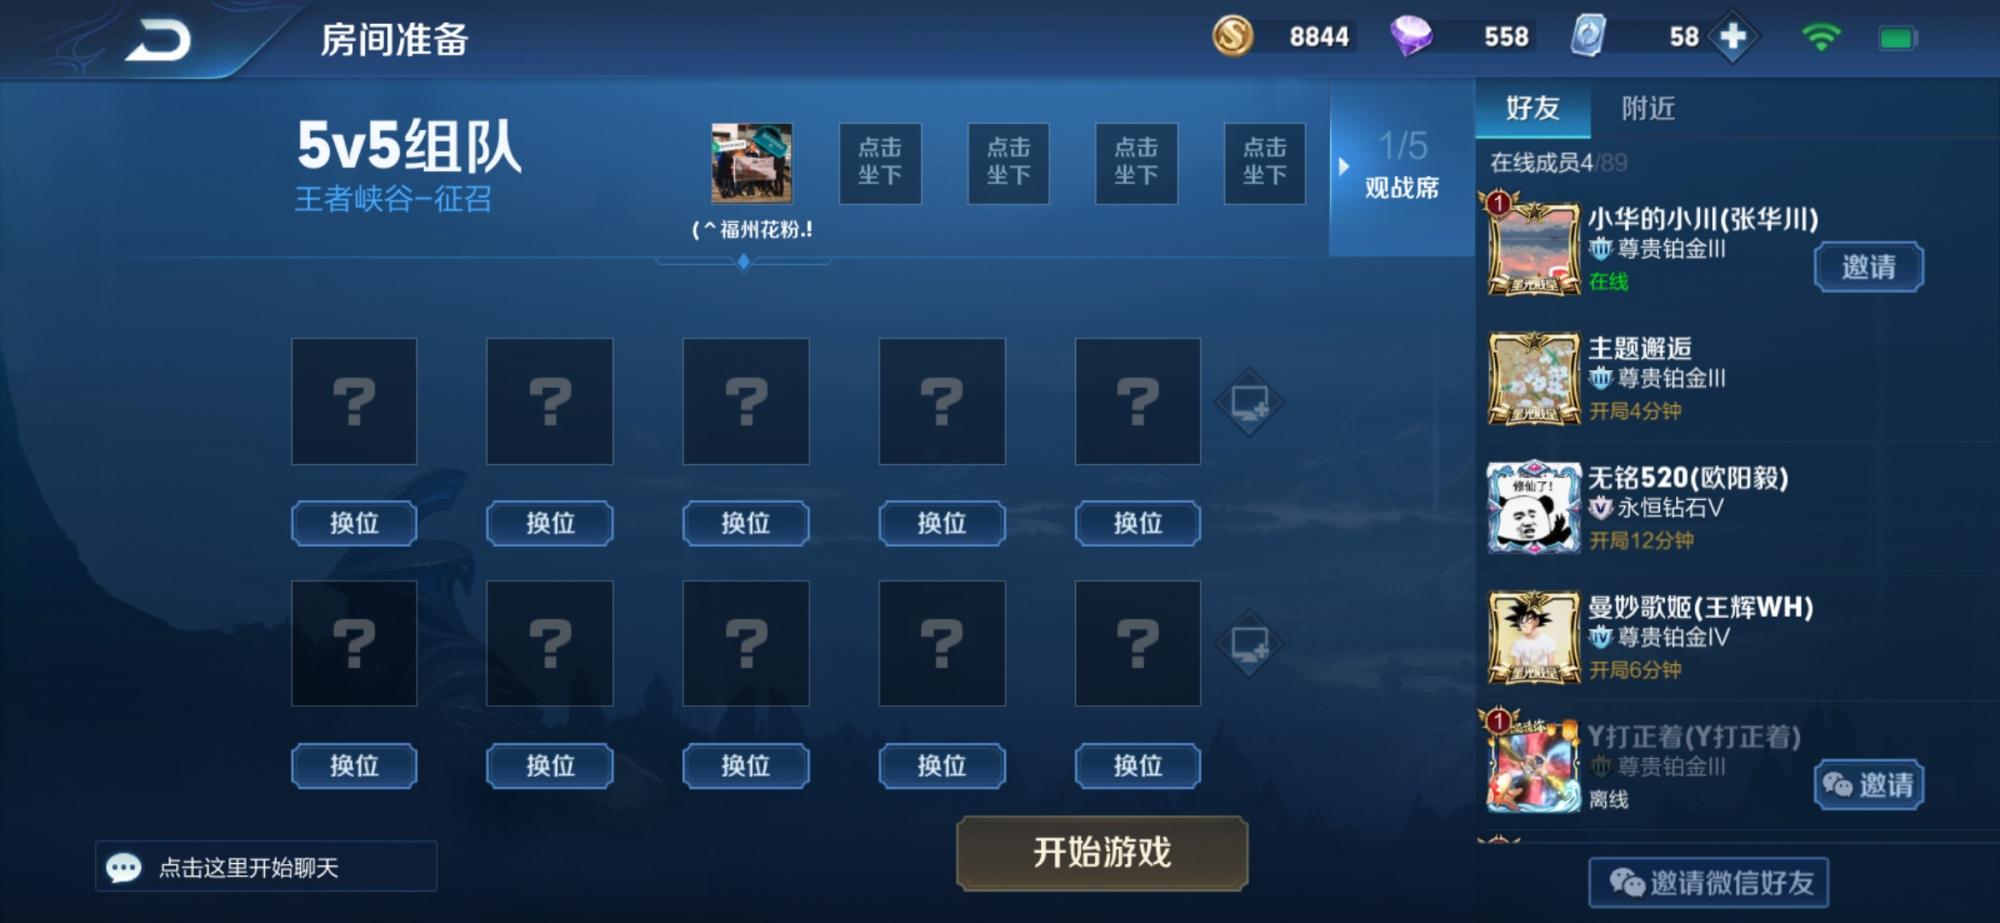 Screenshot_20191102_192756_com.tencent.tmgp.sgame.jpg